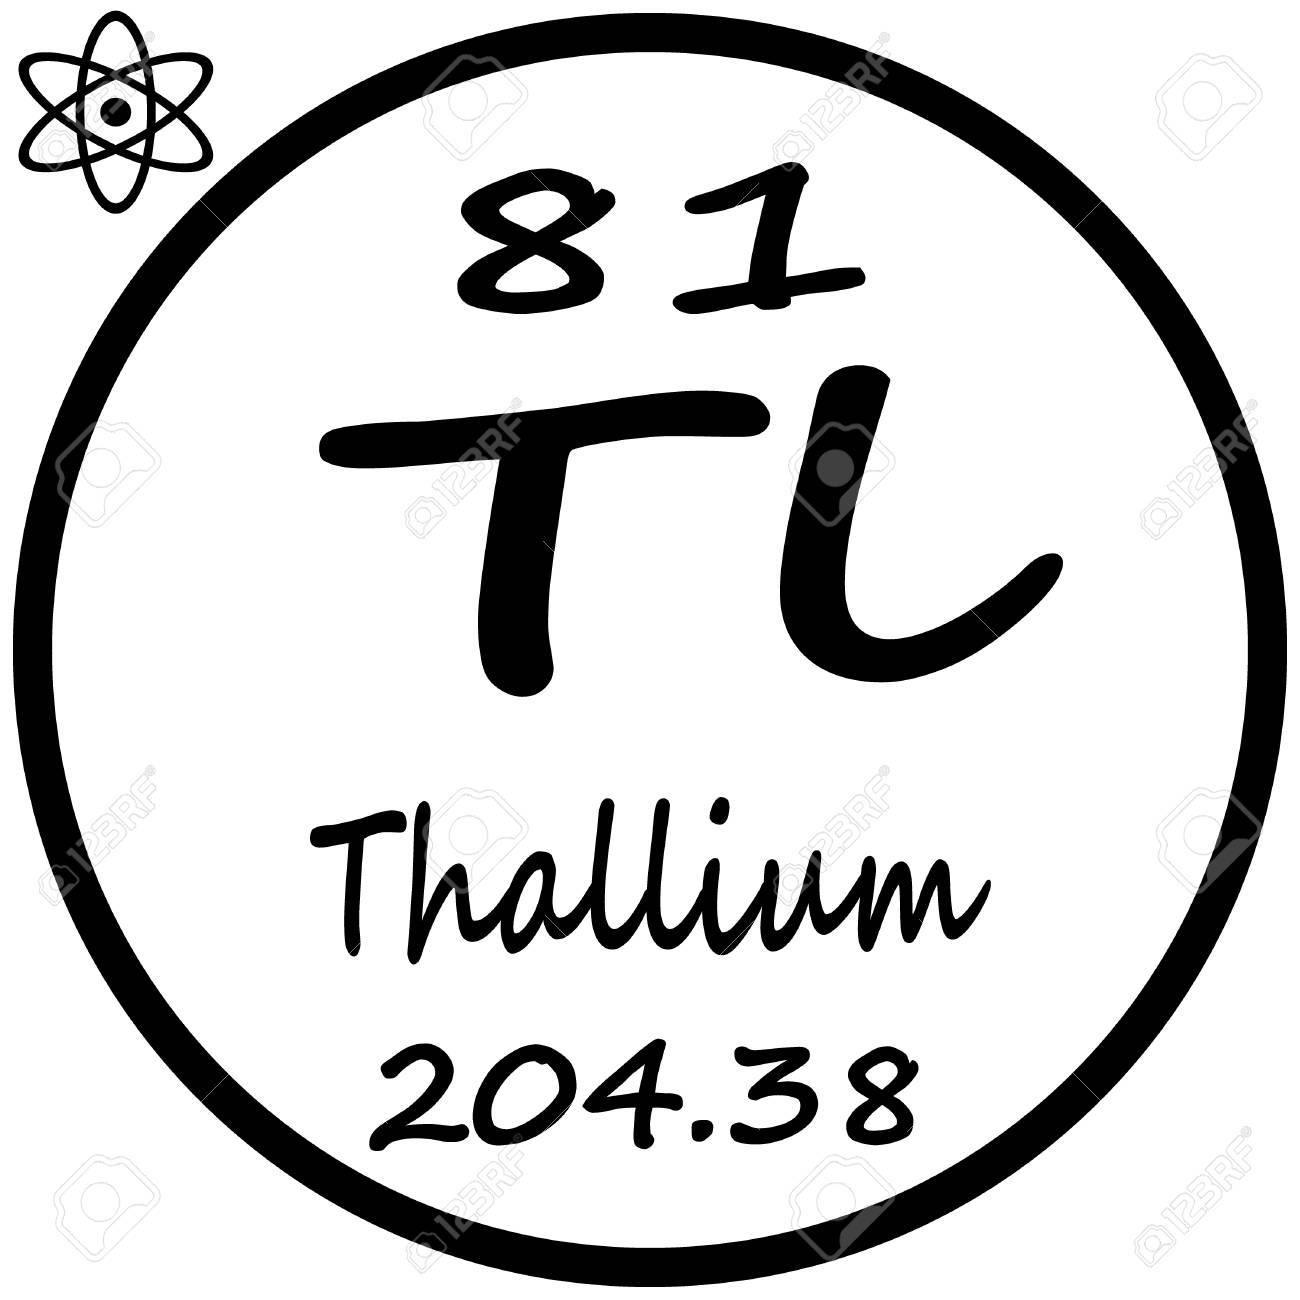 Periodic table of elements thallium royalty free cliparts vectors periodic table of elements thallium stock vector 53482374 urtaz Choice Image